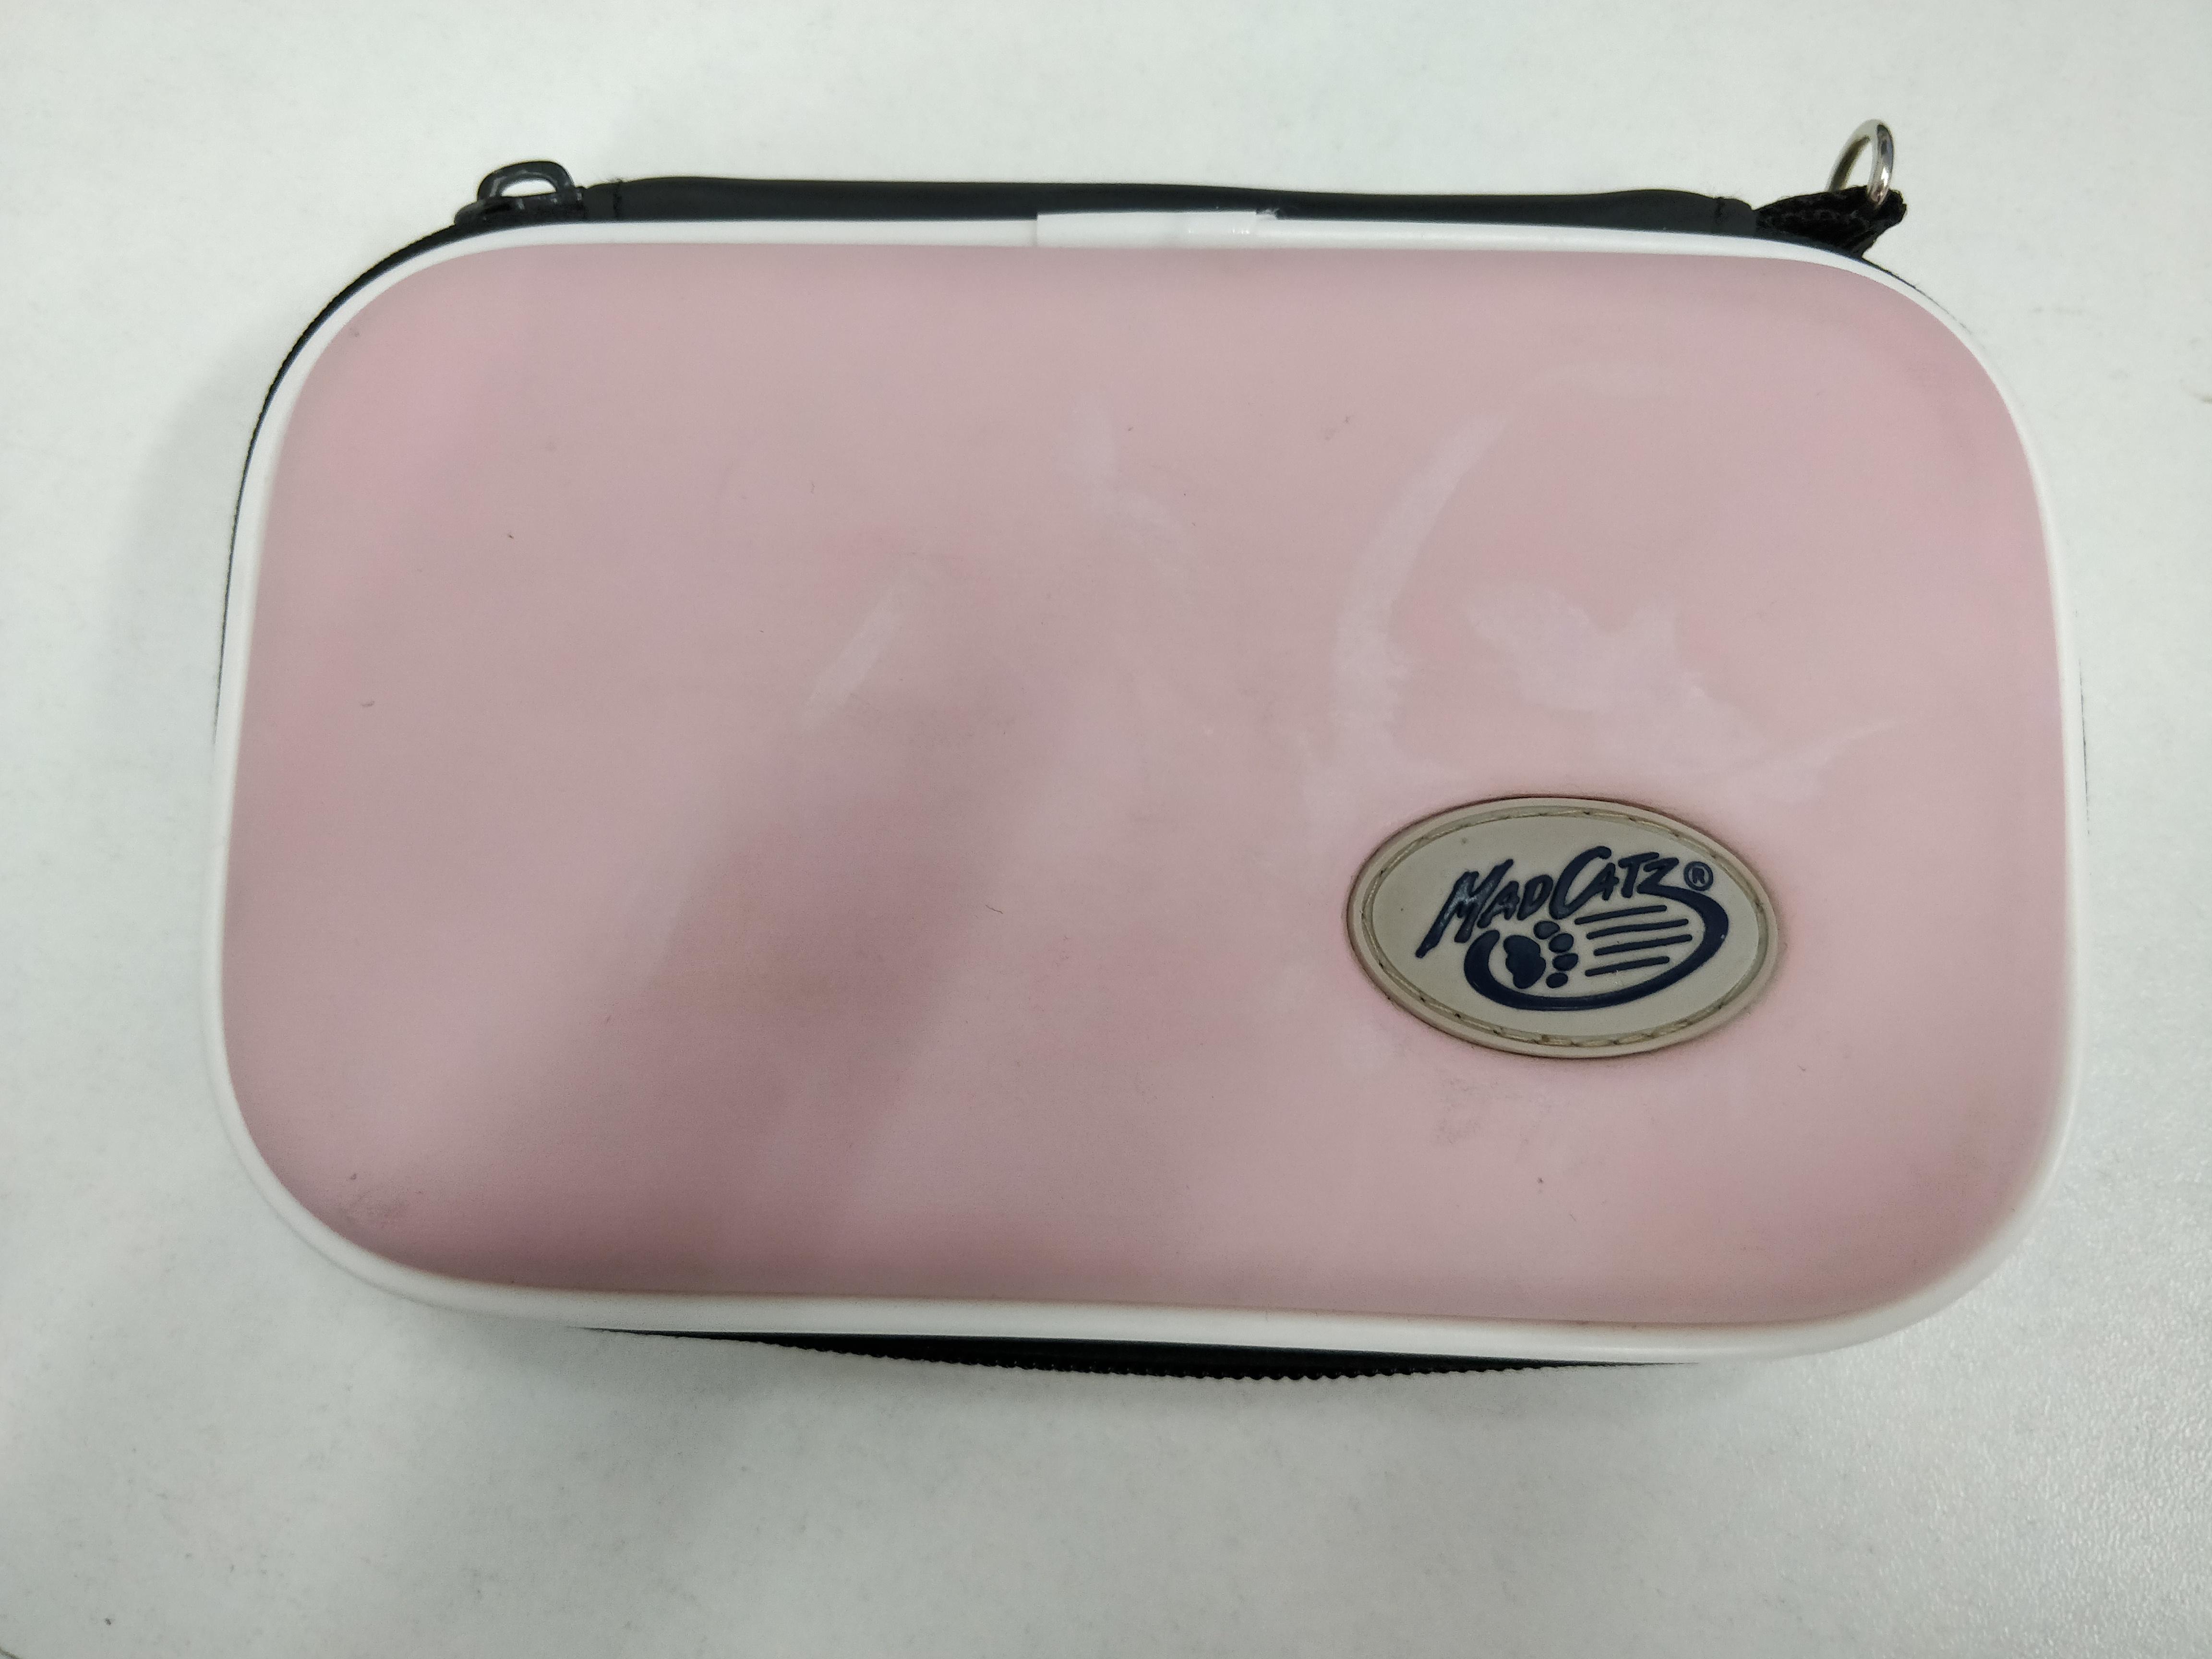 [Nintendo DS| DS Lite] Ochranné pouzdro MadCatz - růžové (estetické vady)